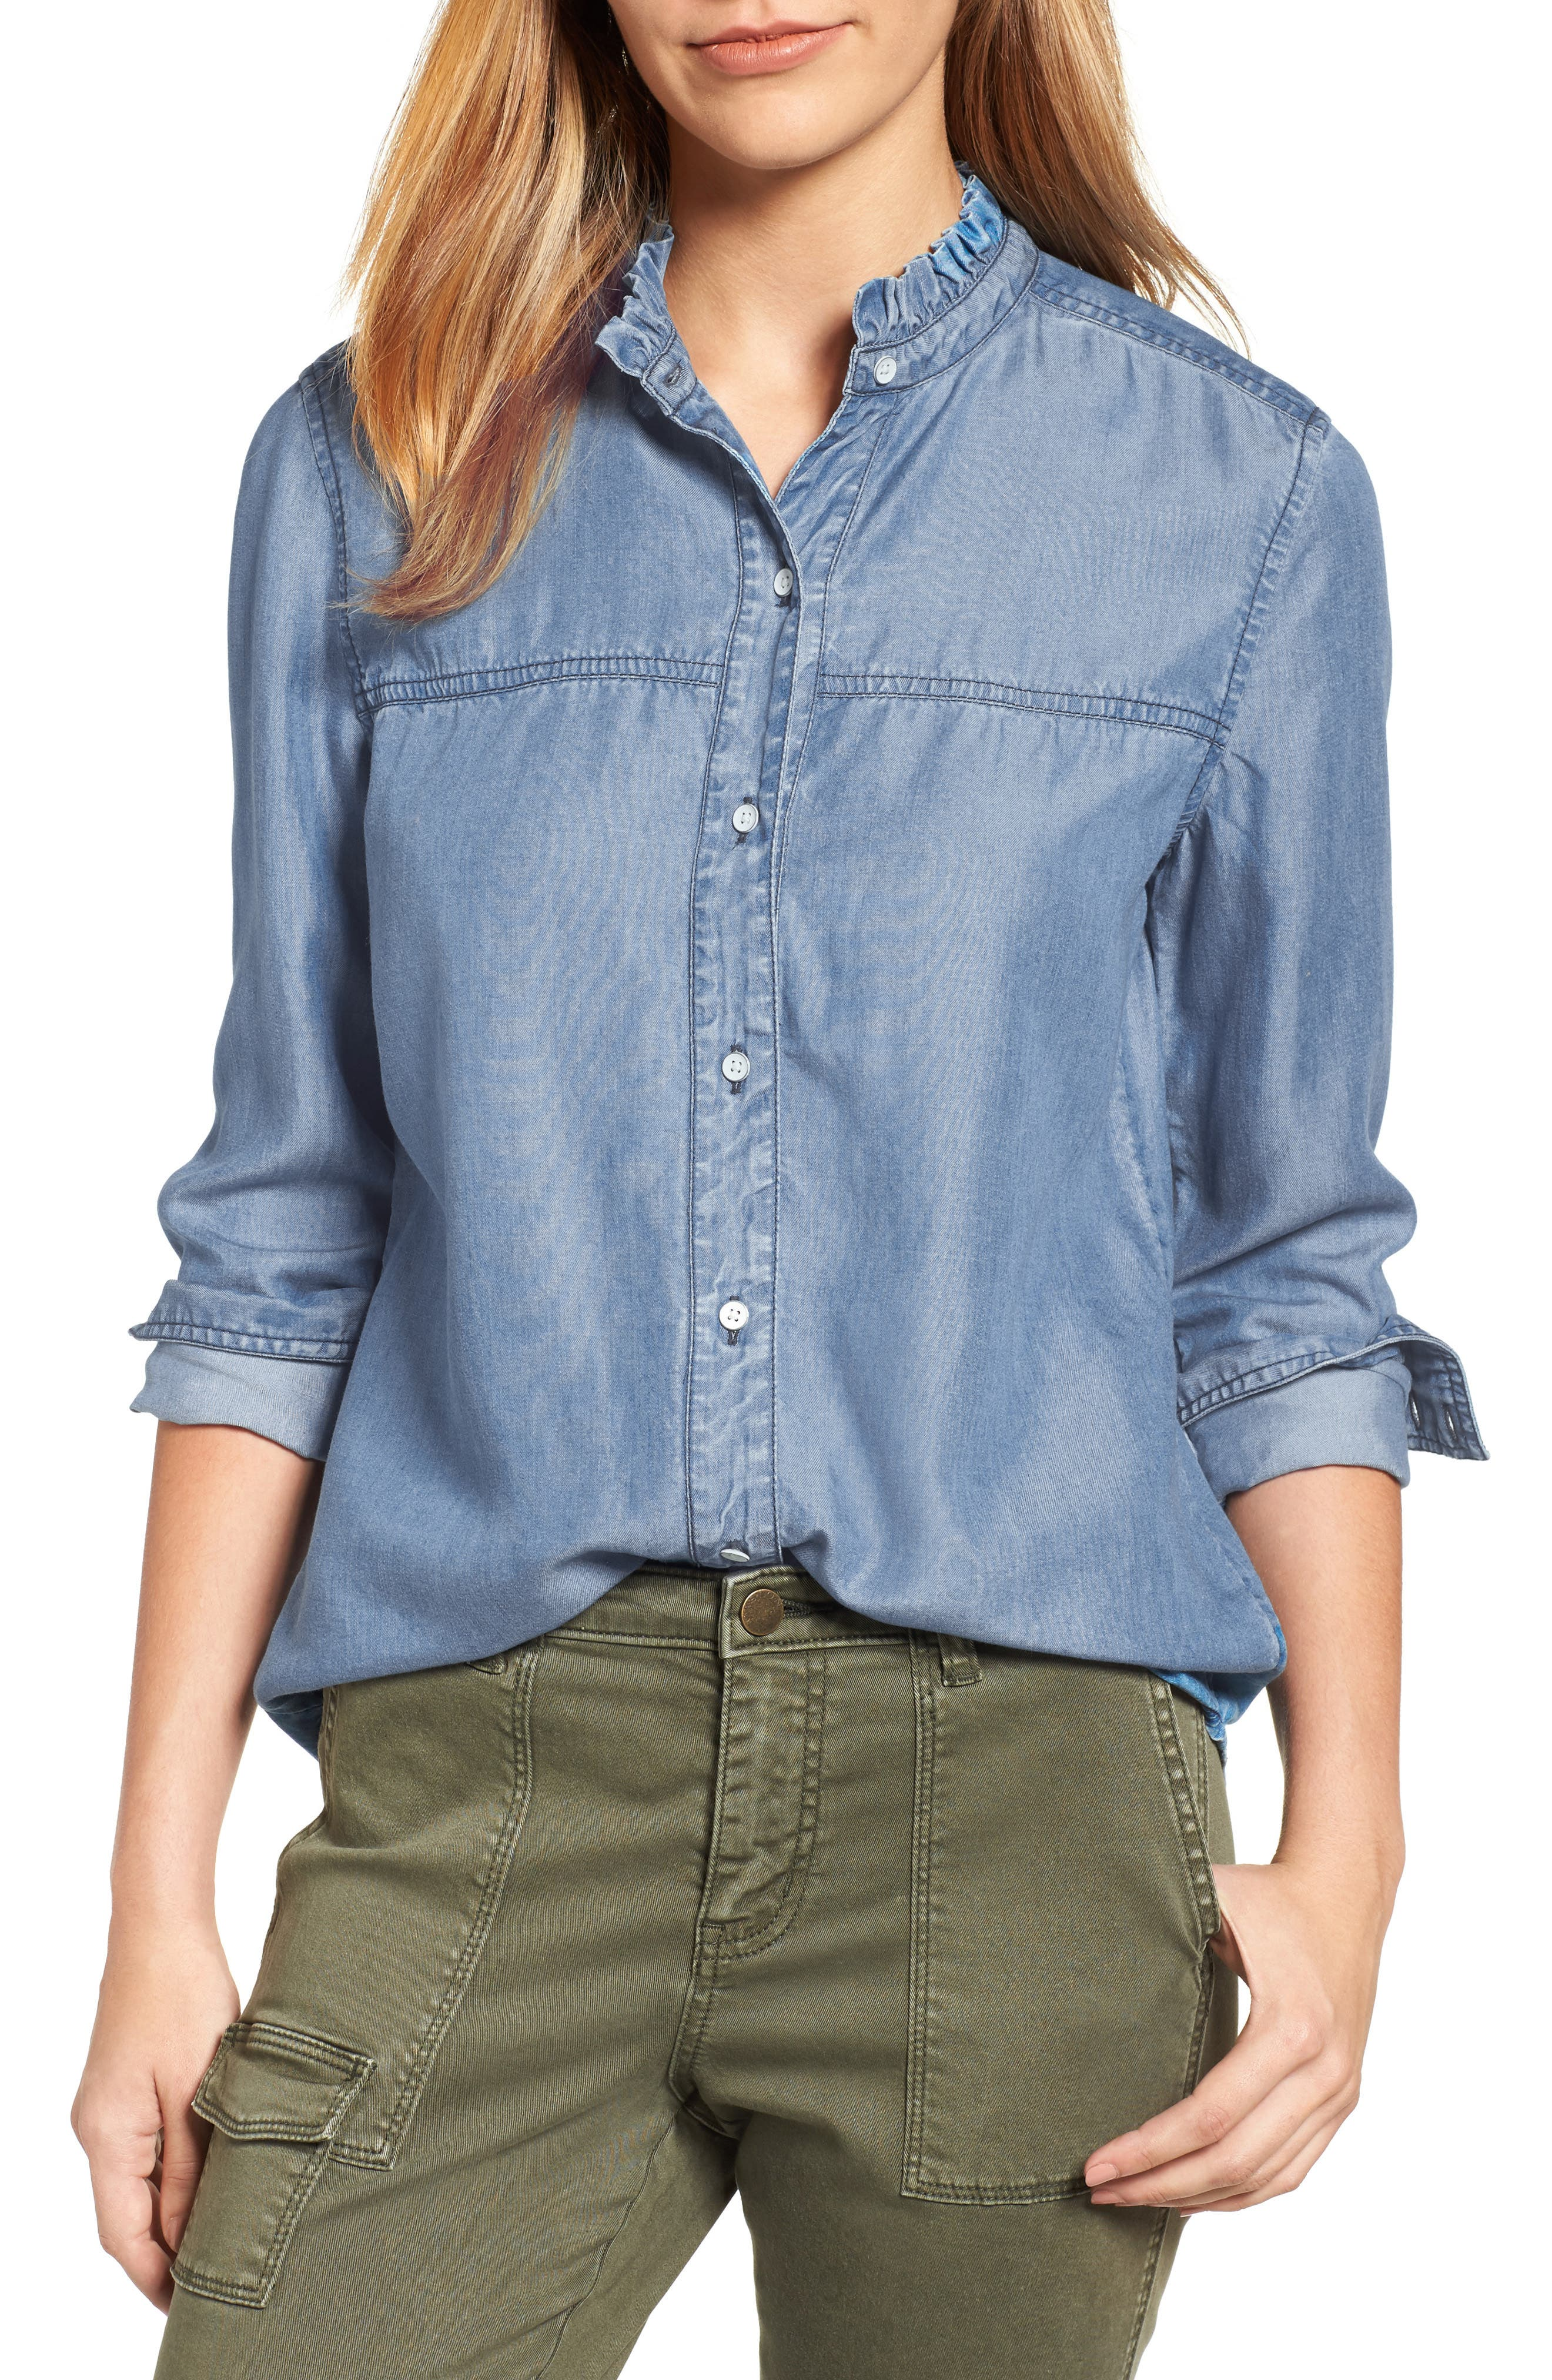 Alternate Image 1 Selected - Caslon® Chambray Shirt (Regular & Petite)